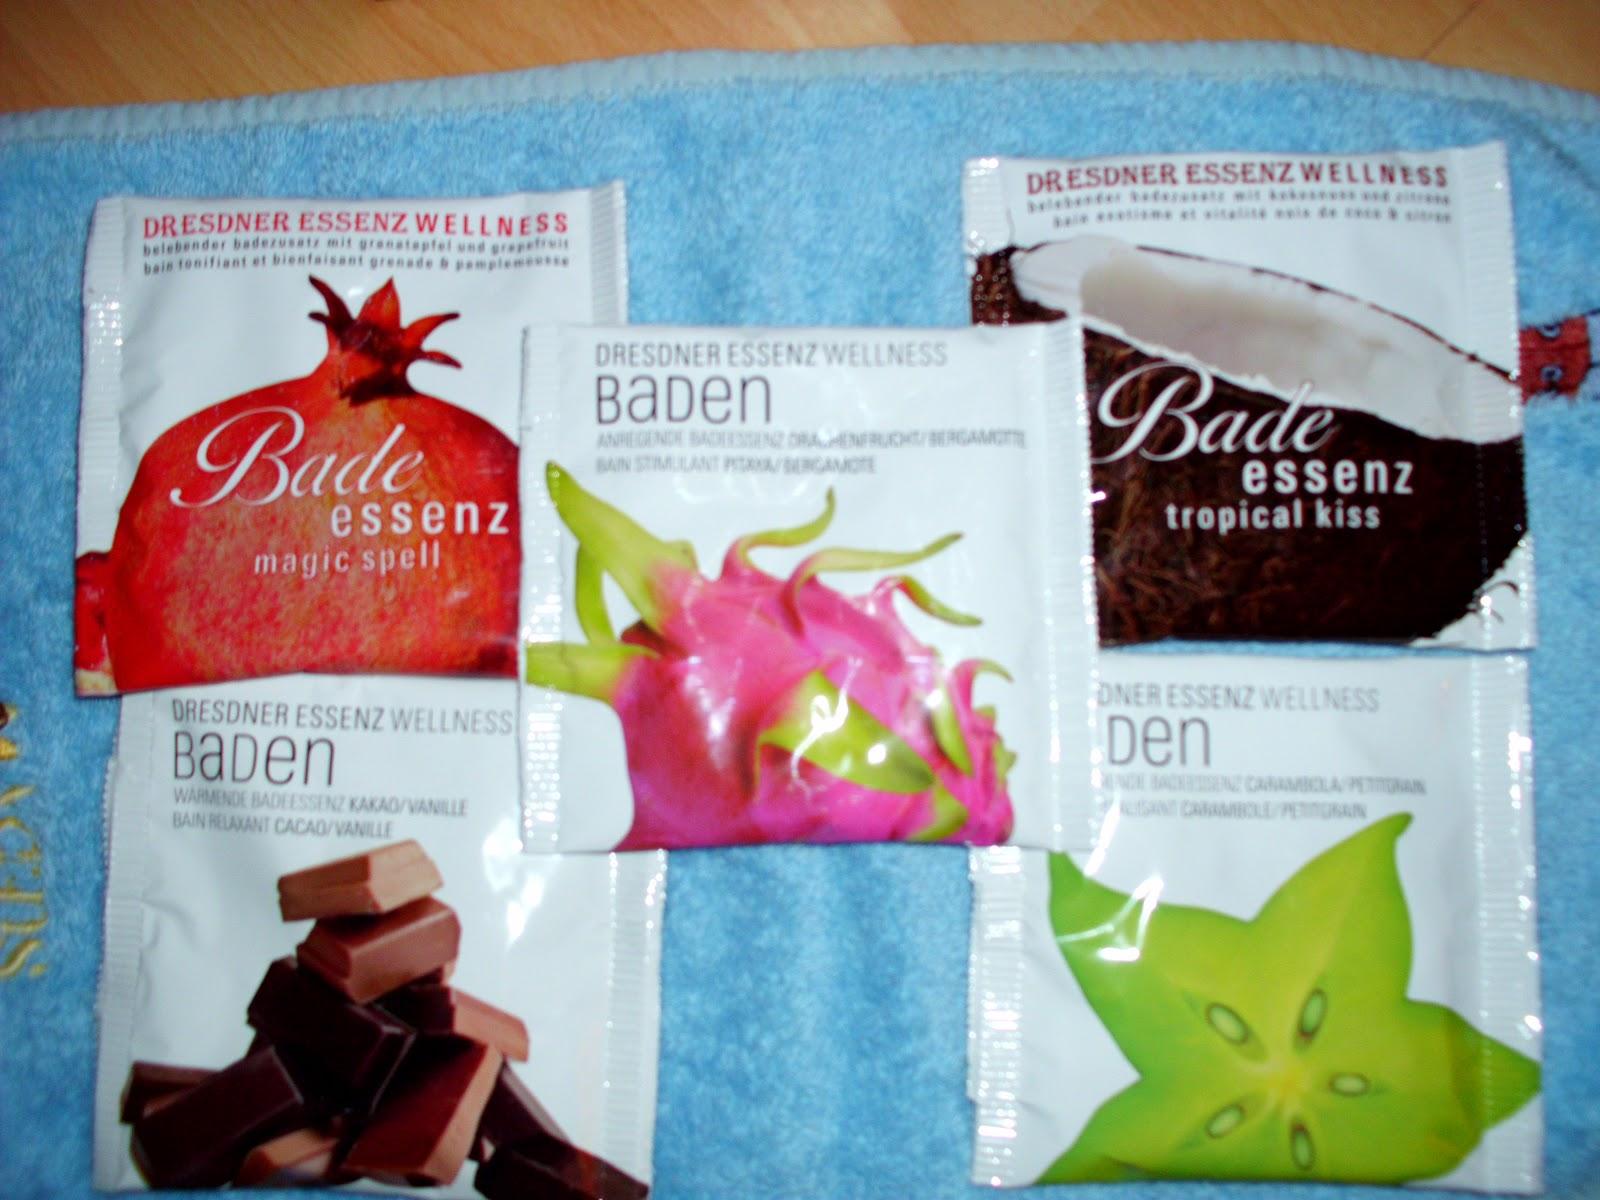 Baden Essenz